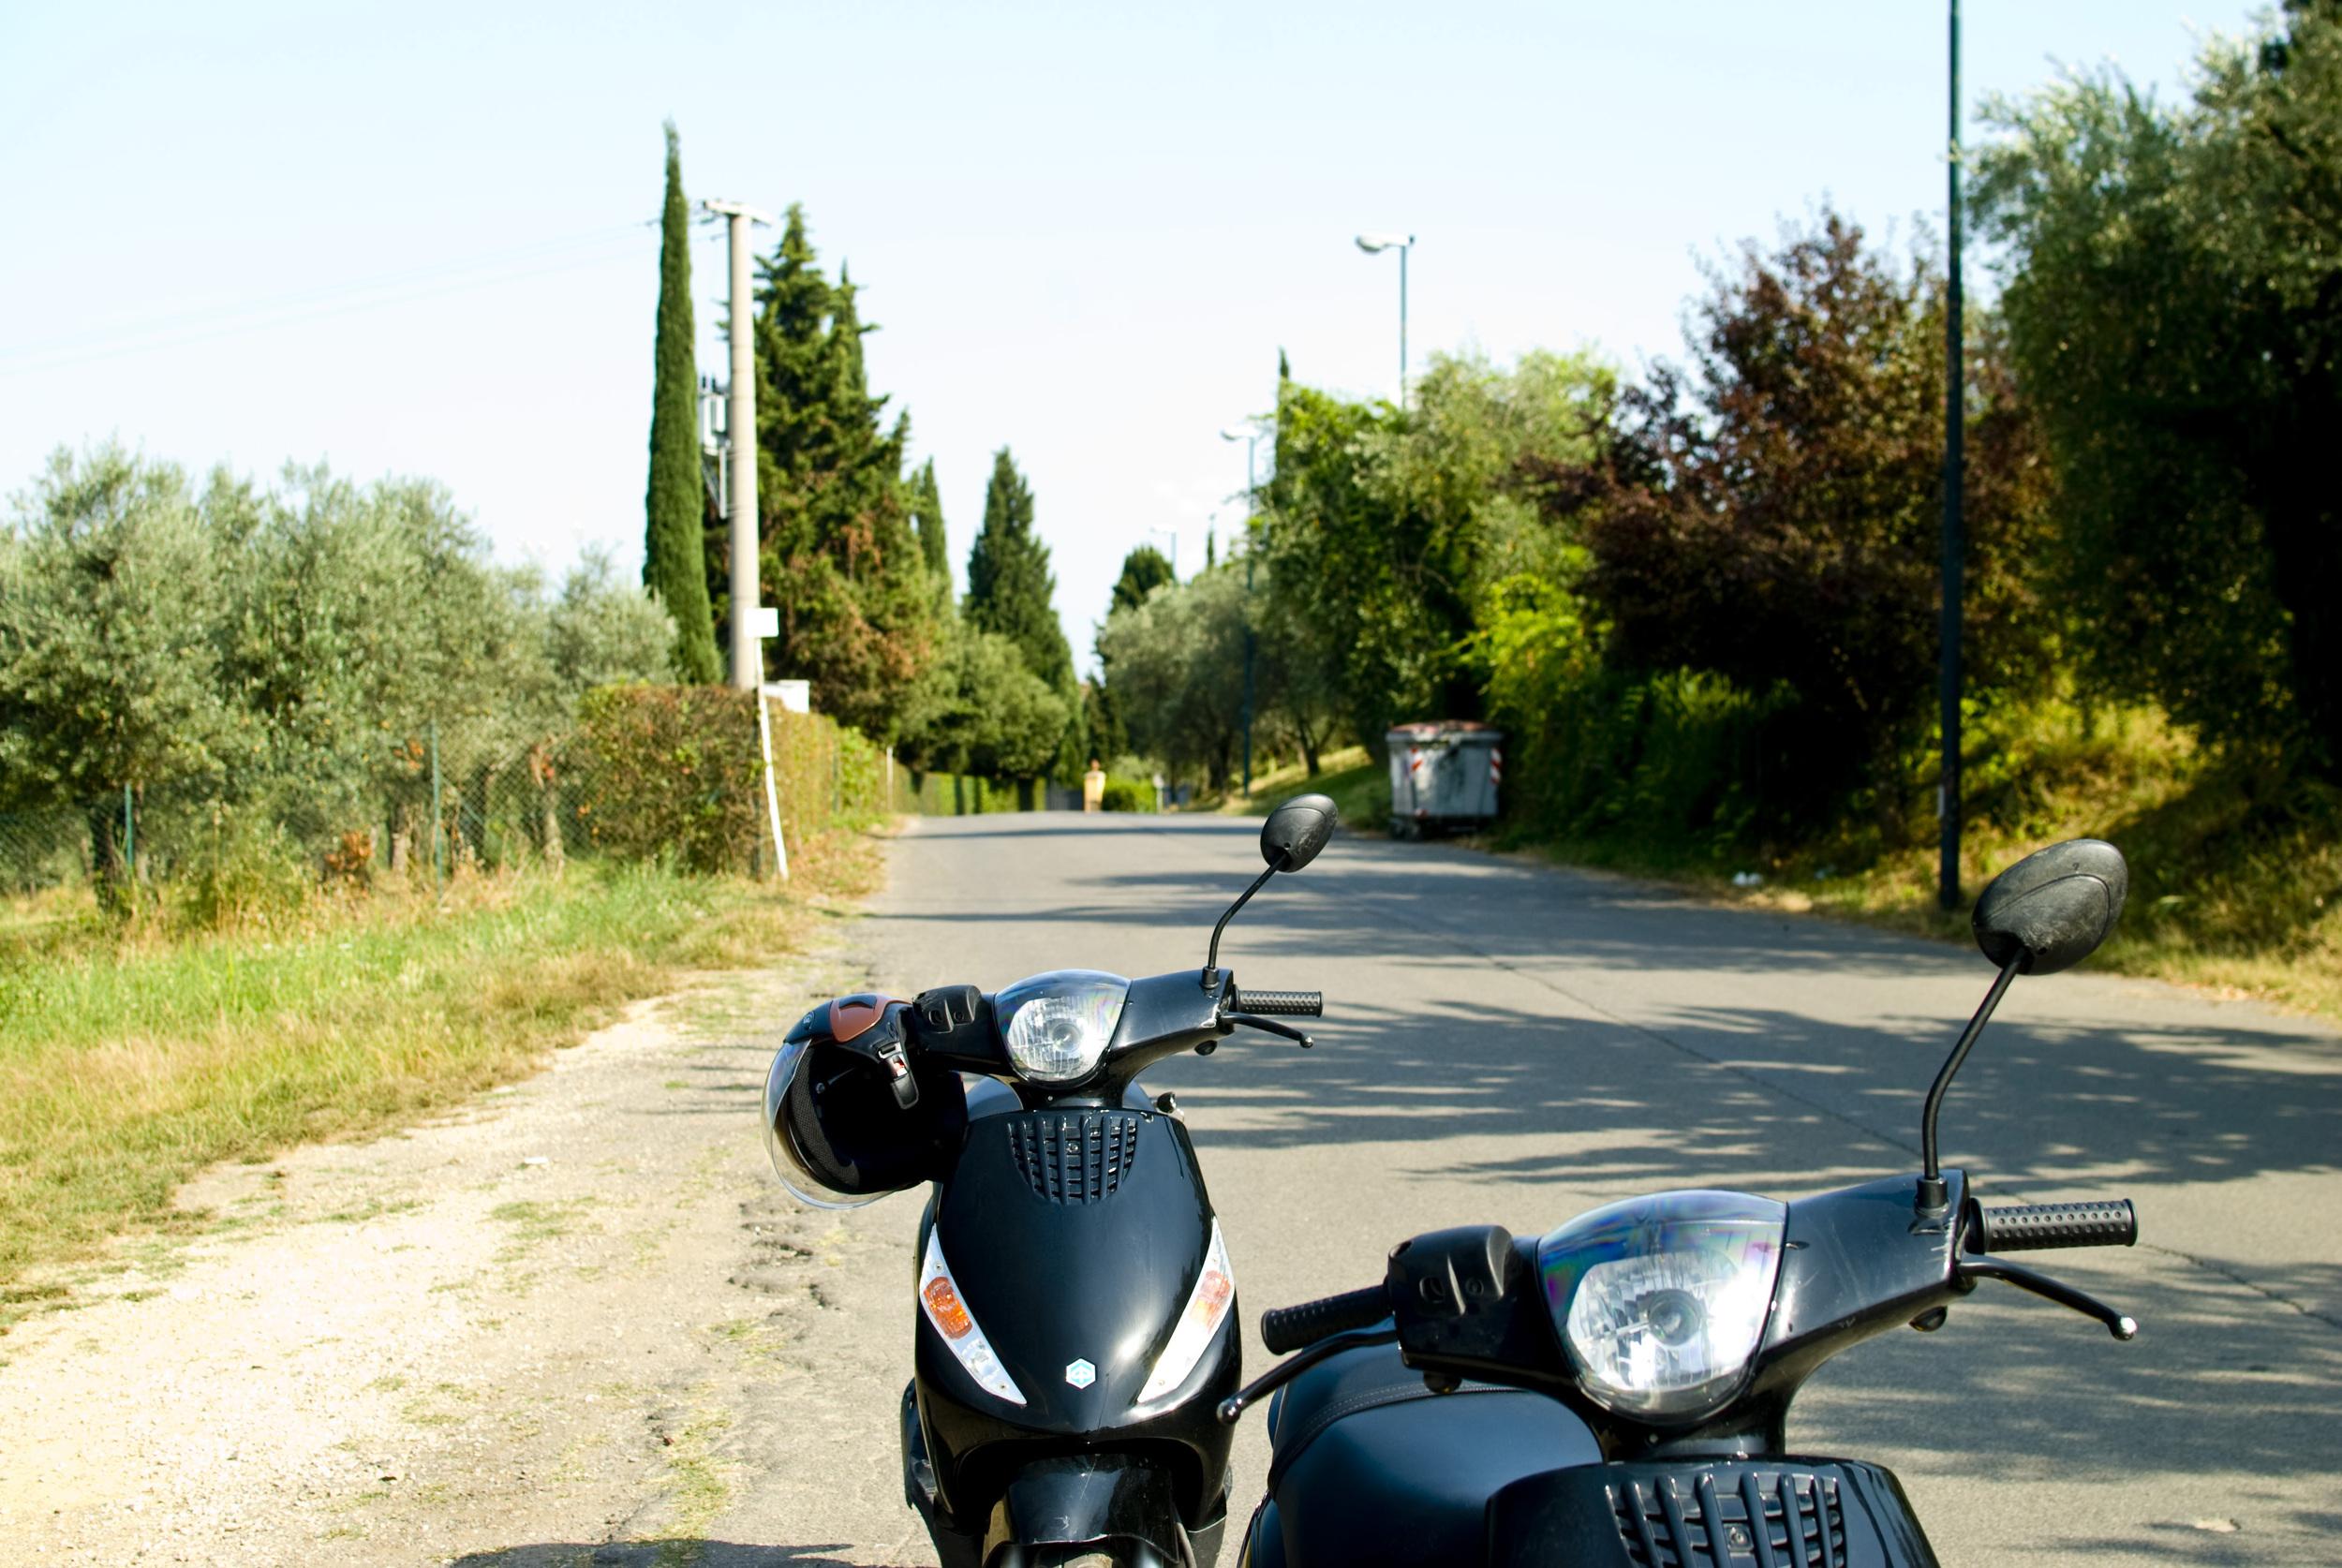 tuscany_4797890986_o.jpg